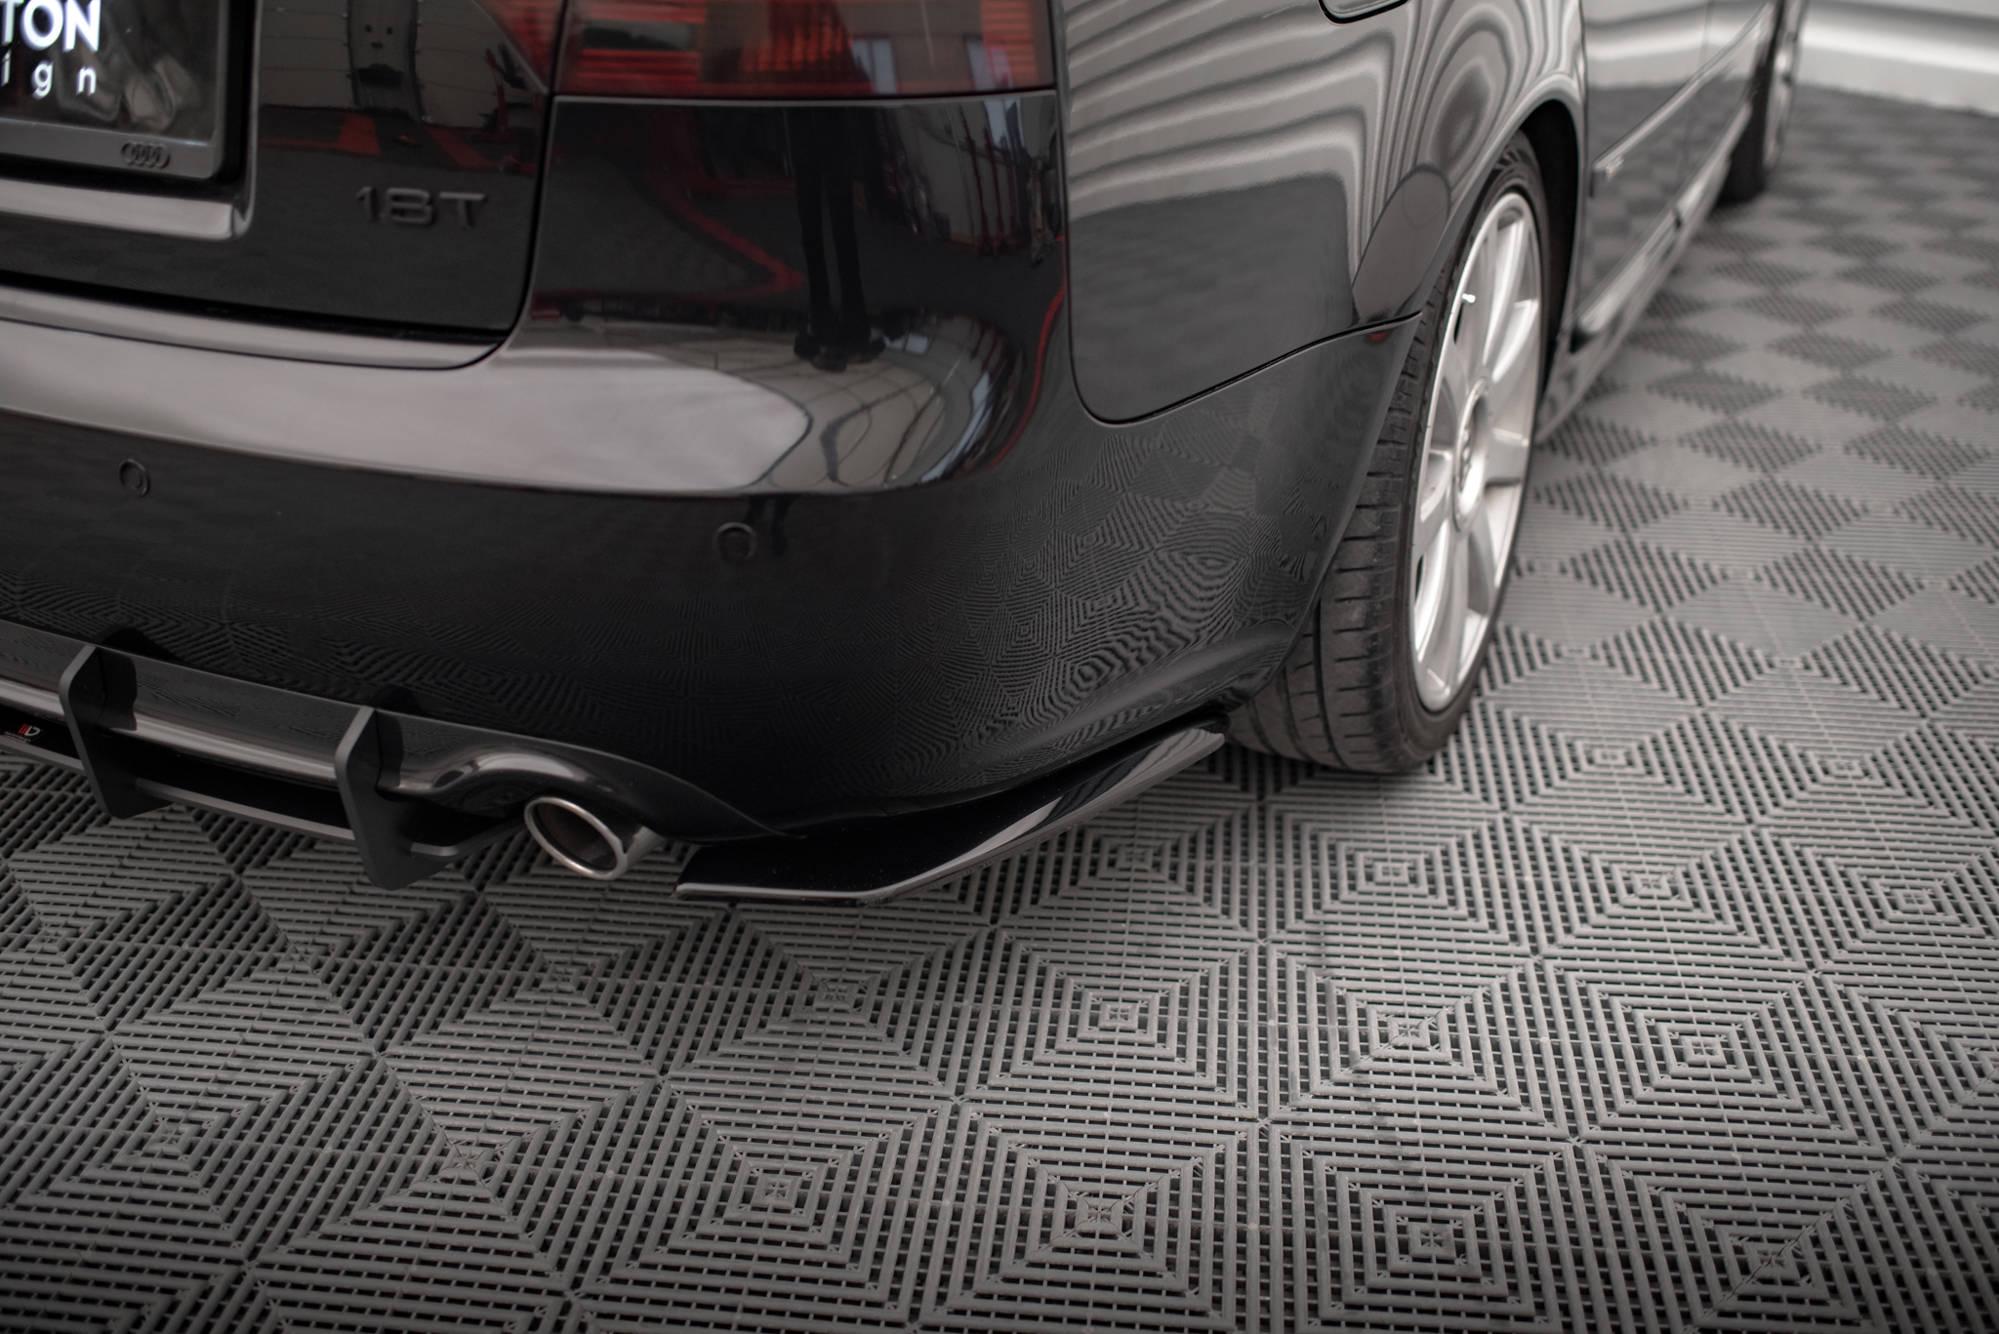 Rear Side Splitters Audi A4 B7 Our Offer Audi A4 S4 Rs4 A4 B7 2004 2009 Sedan Our Offer Audi A4 S4 Rs4 A4 B7 2004 2009 Avant Maxton Design